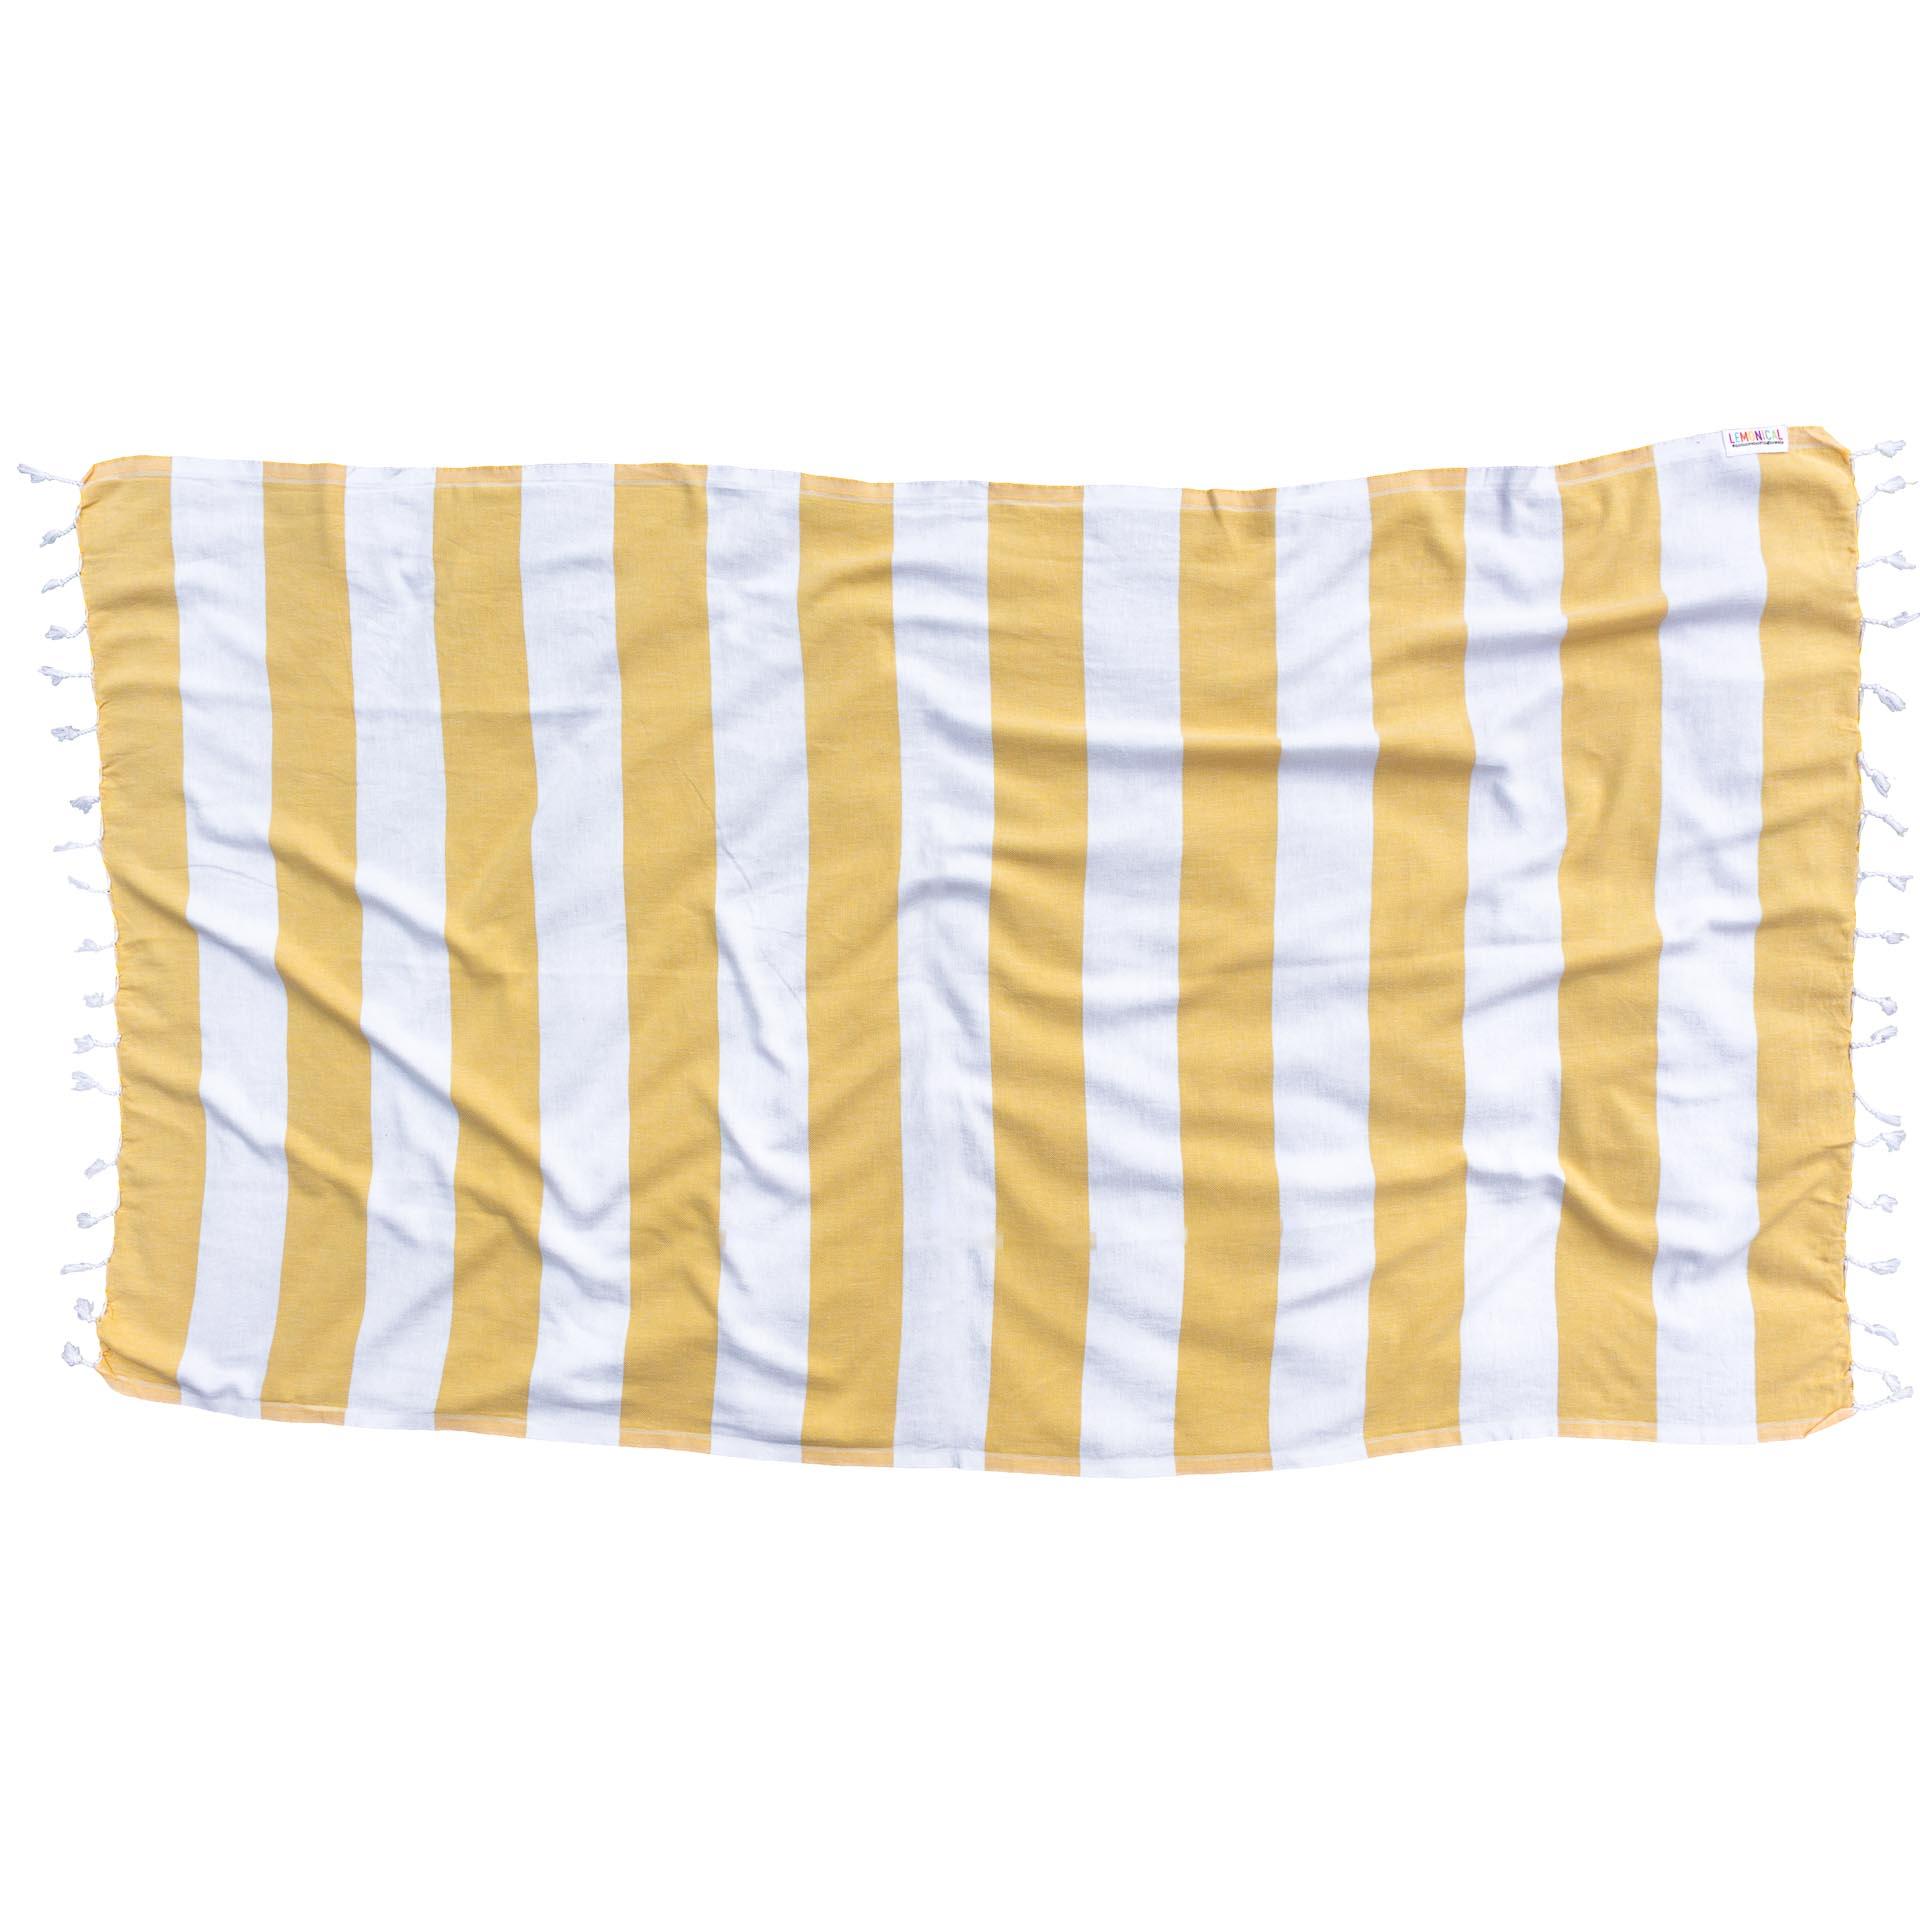 Melon beach towel LEMONICAL